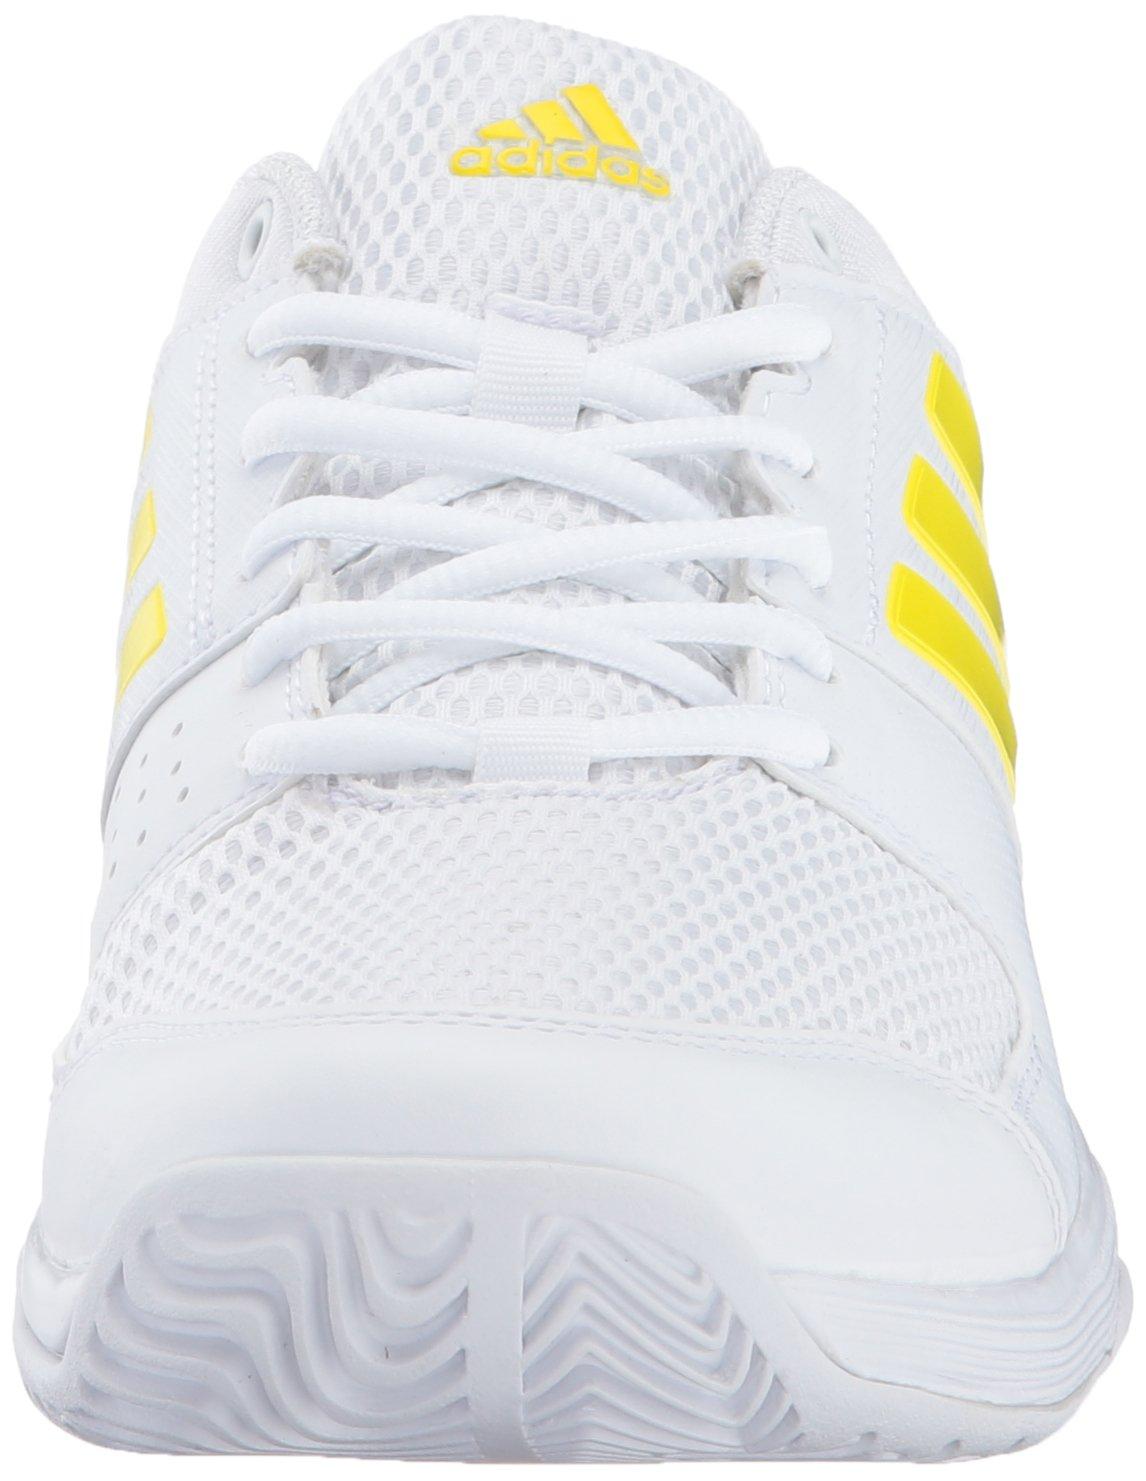 adidas tennisskor